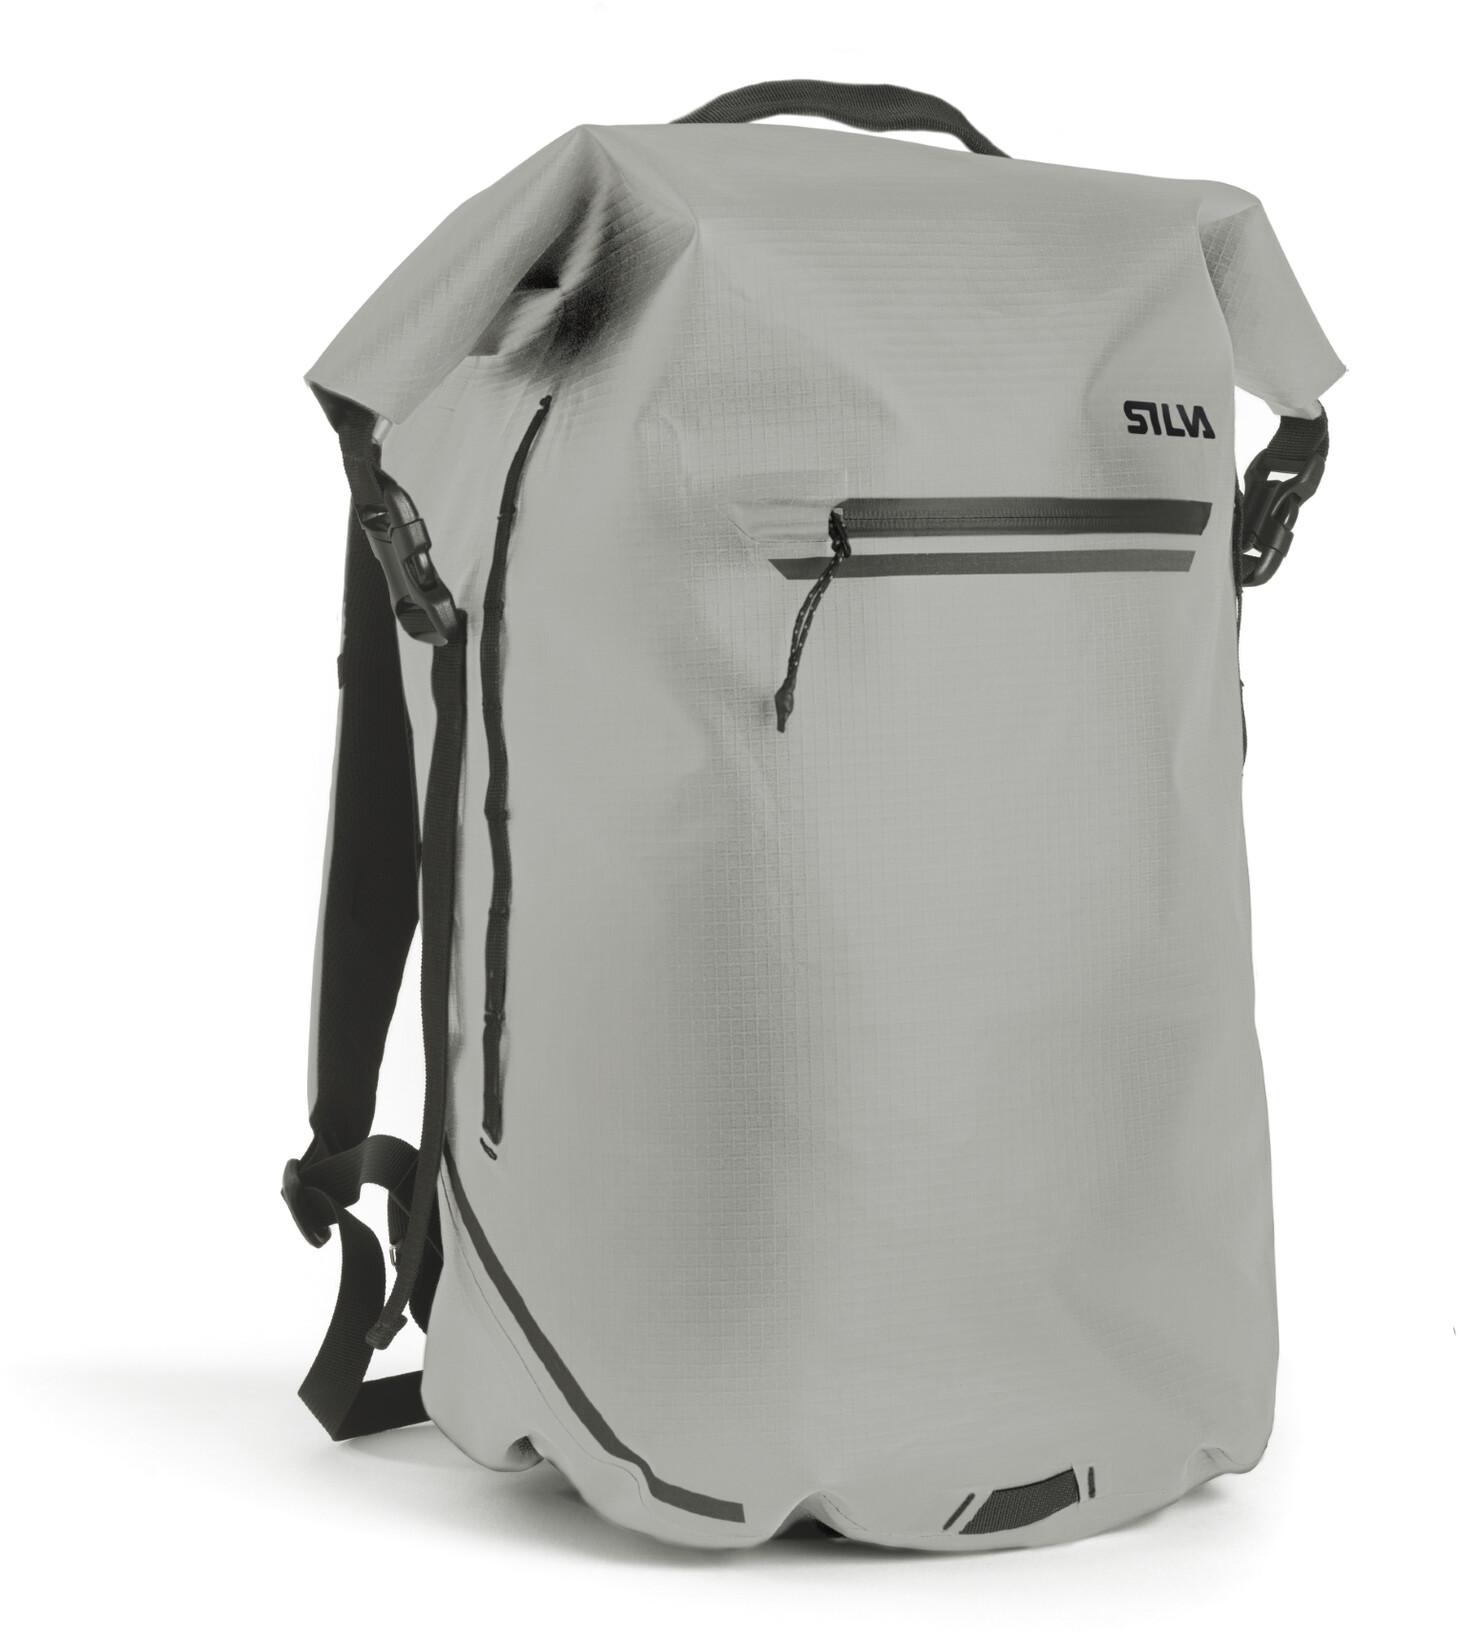 Silva 360° Orbit Rygsæk 30l, universal (2019) | Travel bags